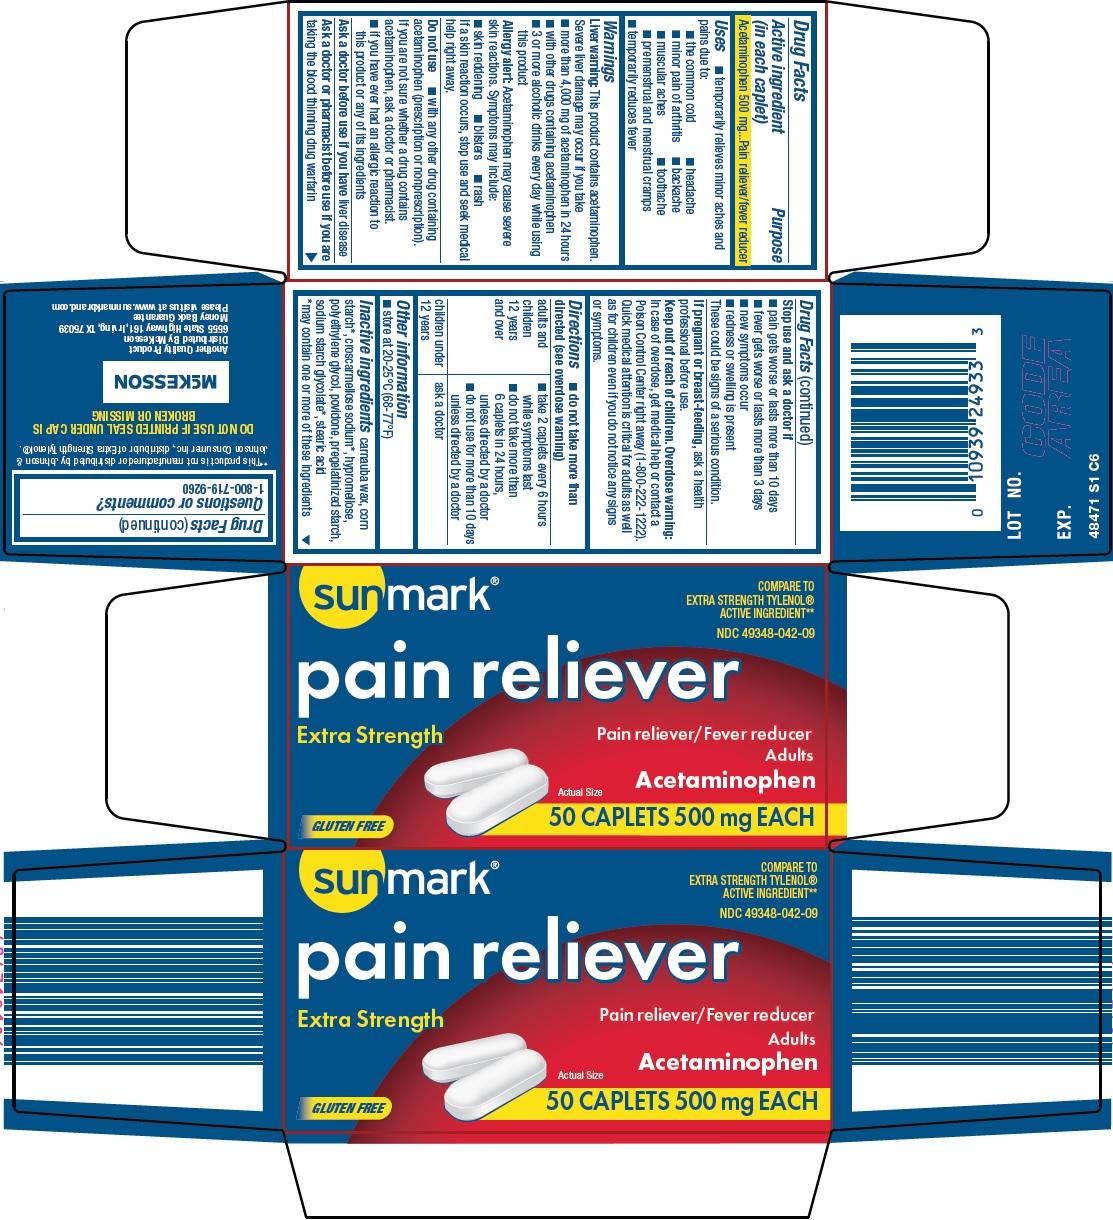 SUNMARK PAIN RELIEVER EXTRA STRENGTH